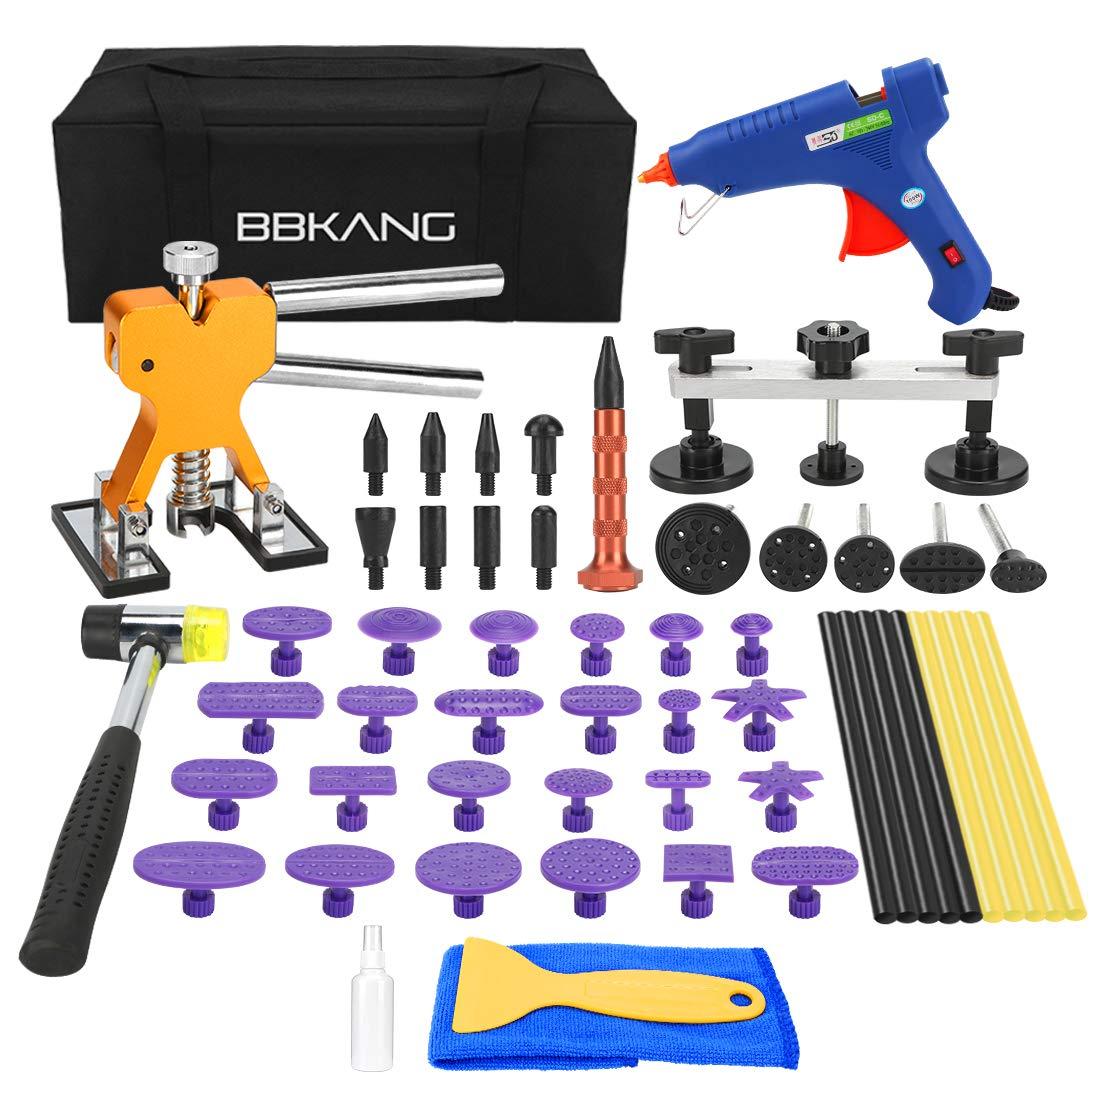 BBKANG Paintless Dent Removal Repair Remover Tool 58pcs Kit Hail Dent Bridge Puller Set Dent Lifter Tap Down Tools for Car Hail Damage Door Ding Fix Tool Kit